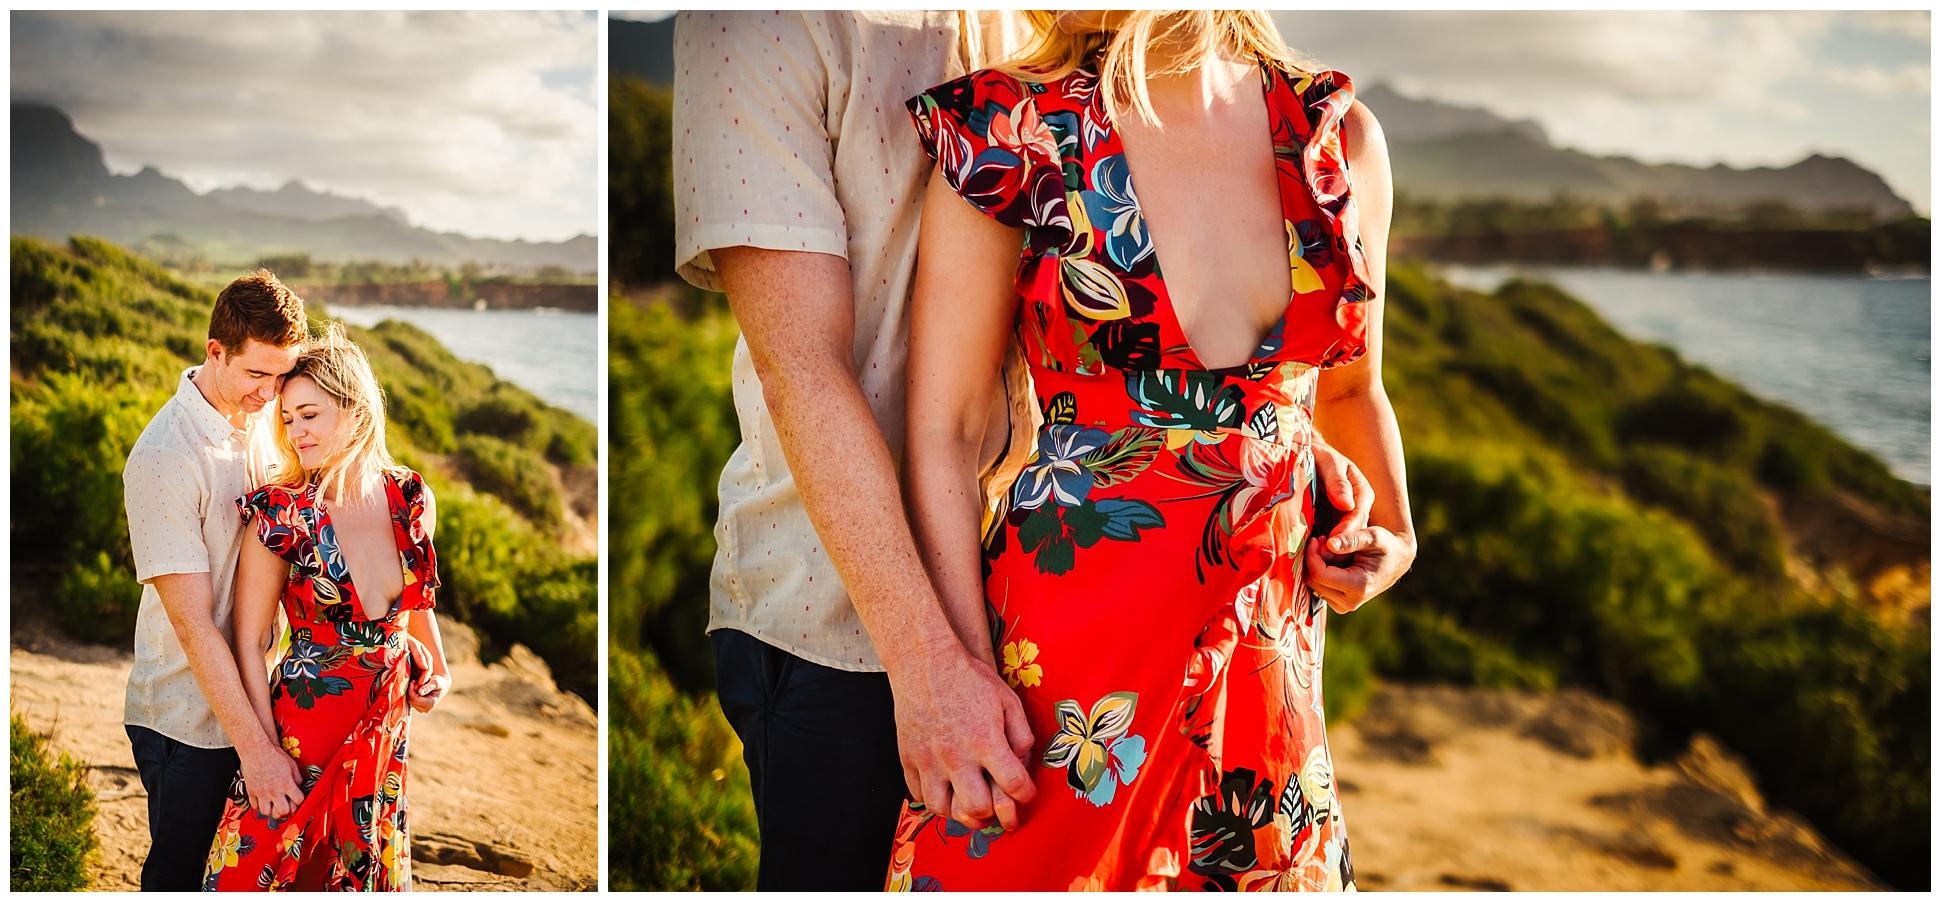 hawaiin-honeymoon-sunrise-portraits-kauai-grand-hystt-destination-photographer_0014.jpg